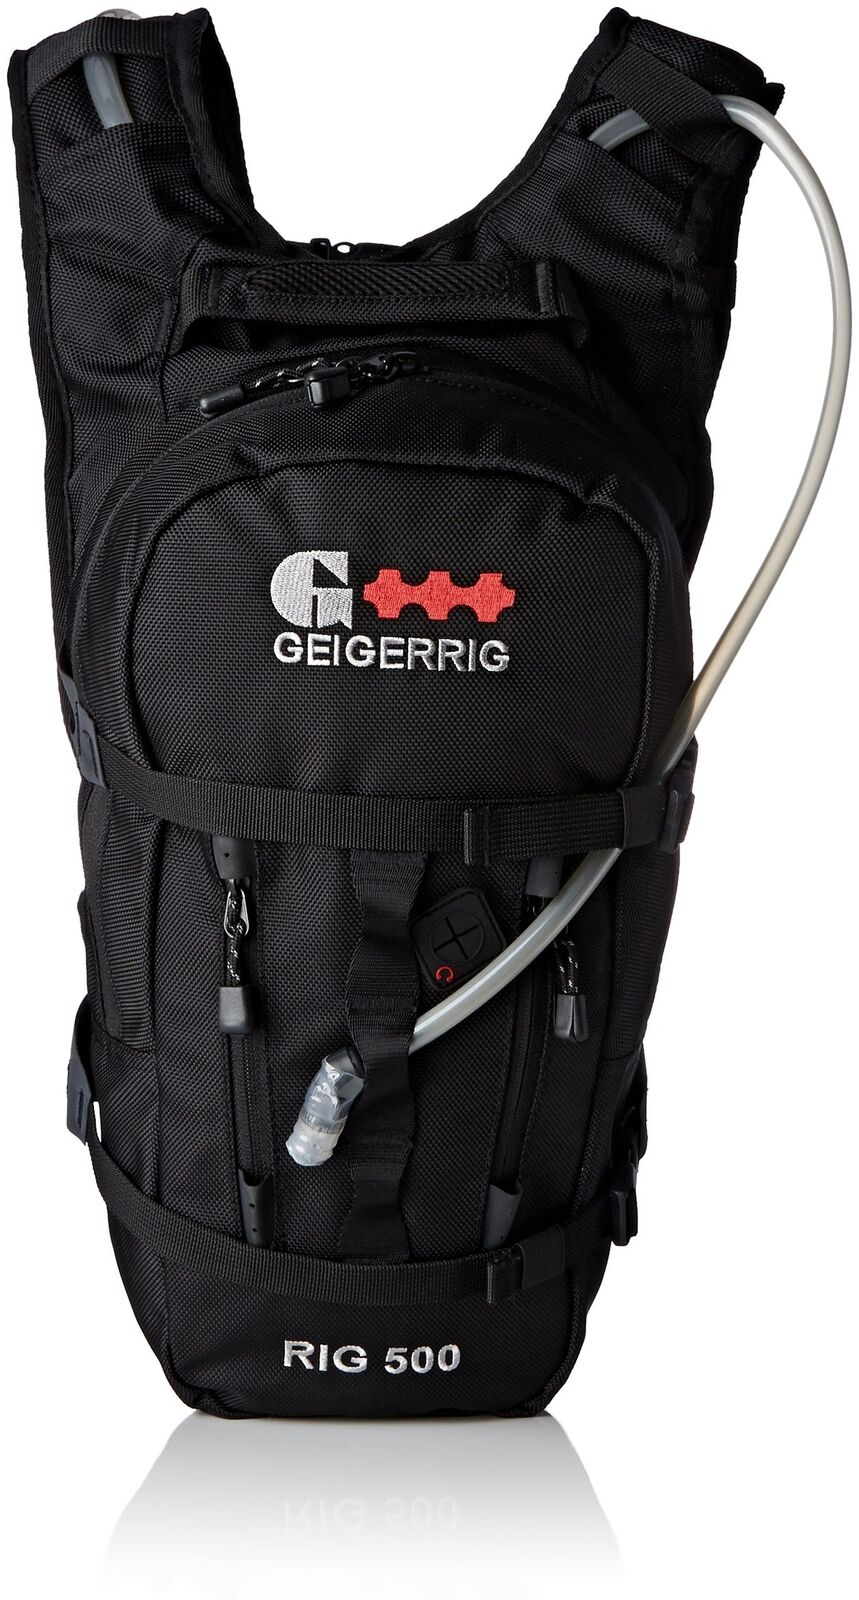 Geigerrig Rig 500 (Negro) Hydration Pack